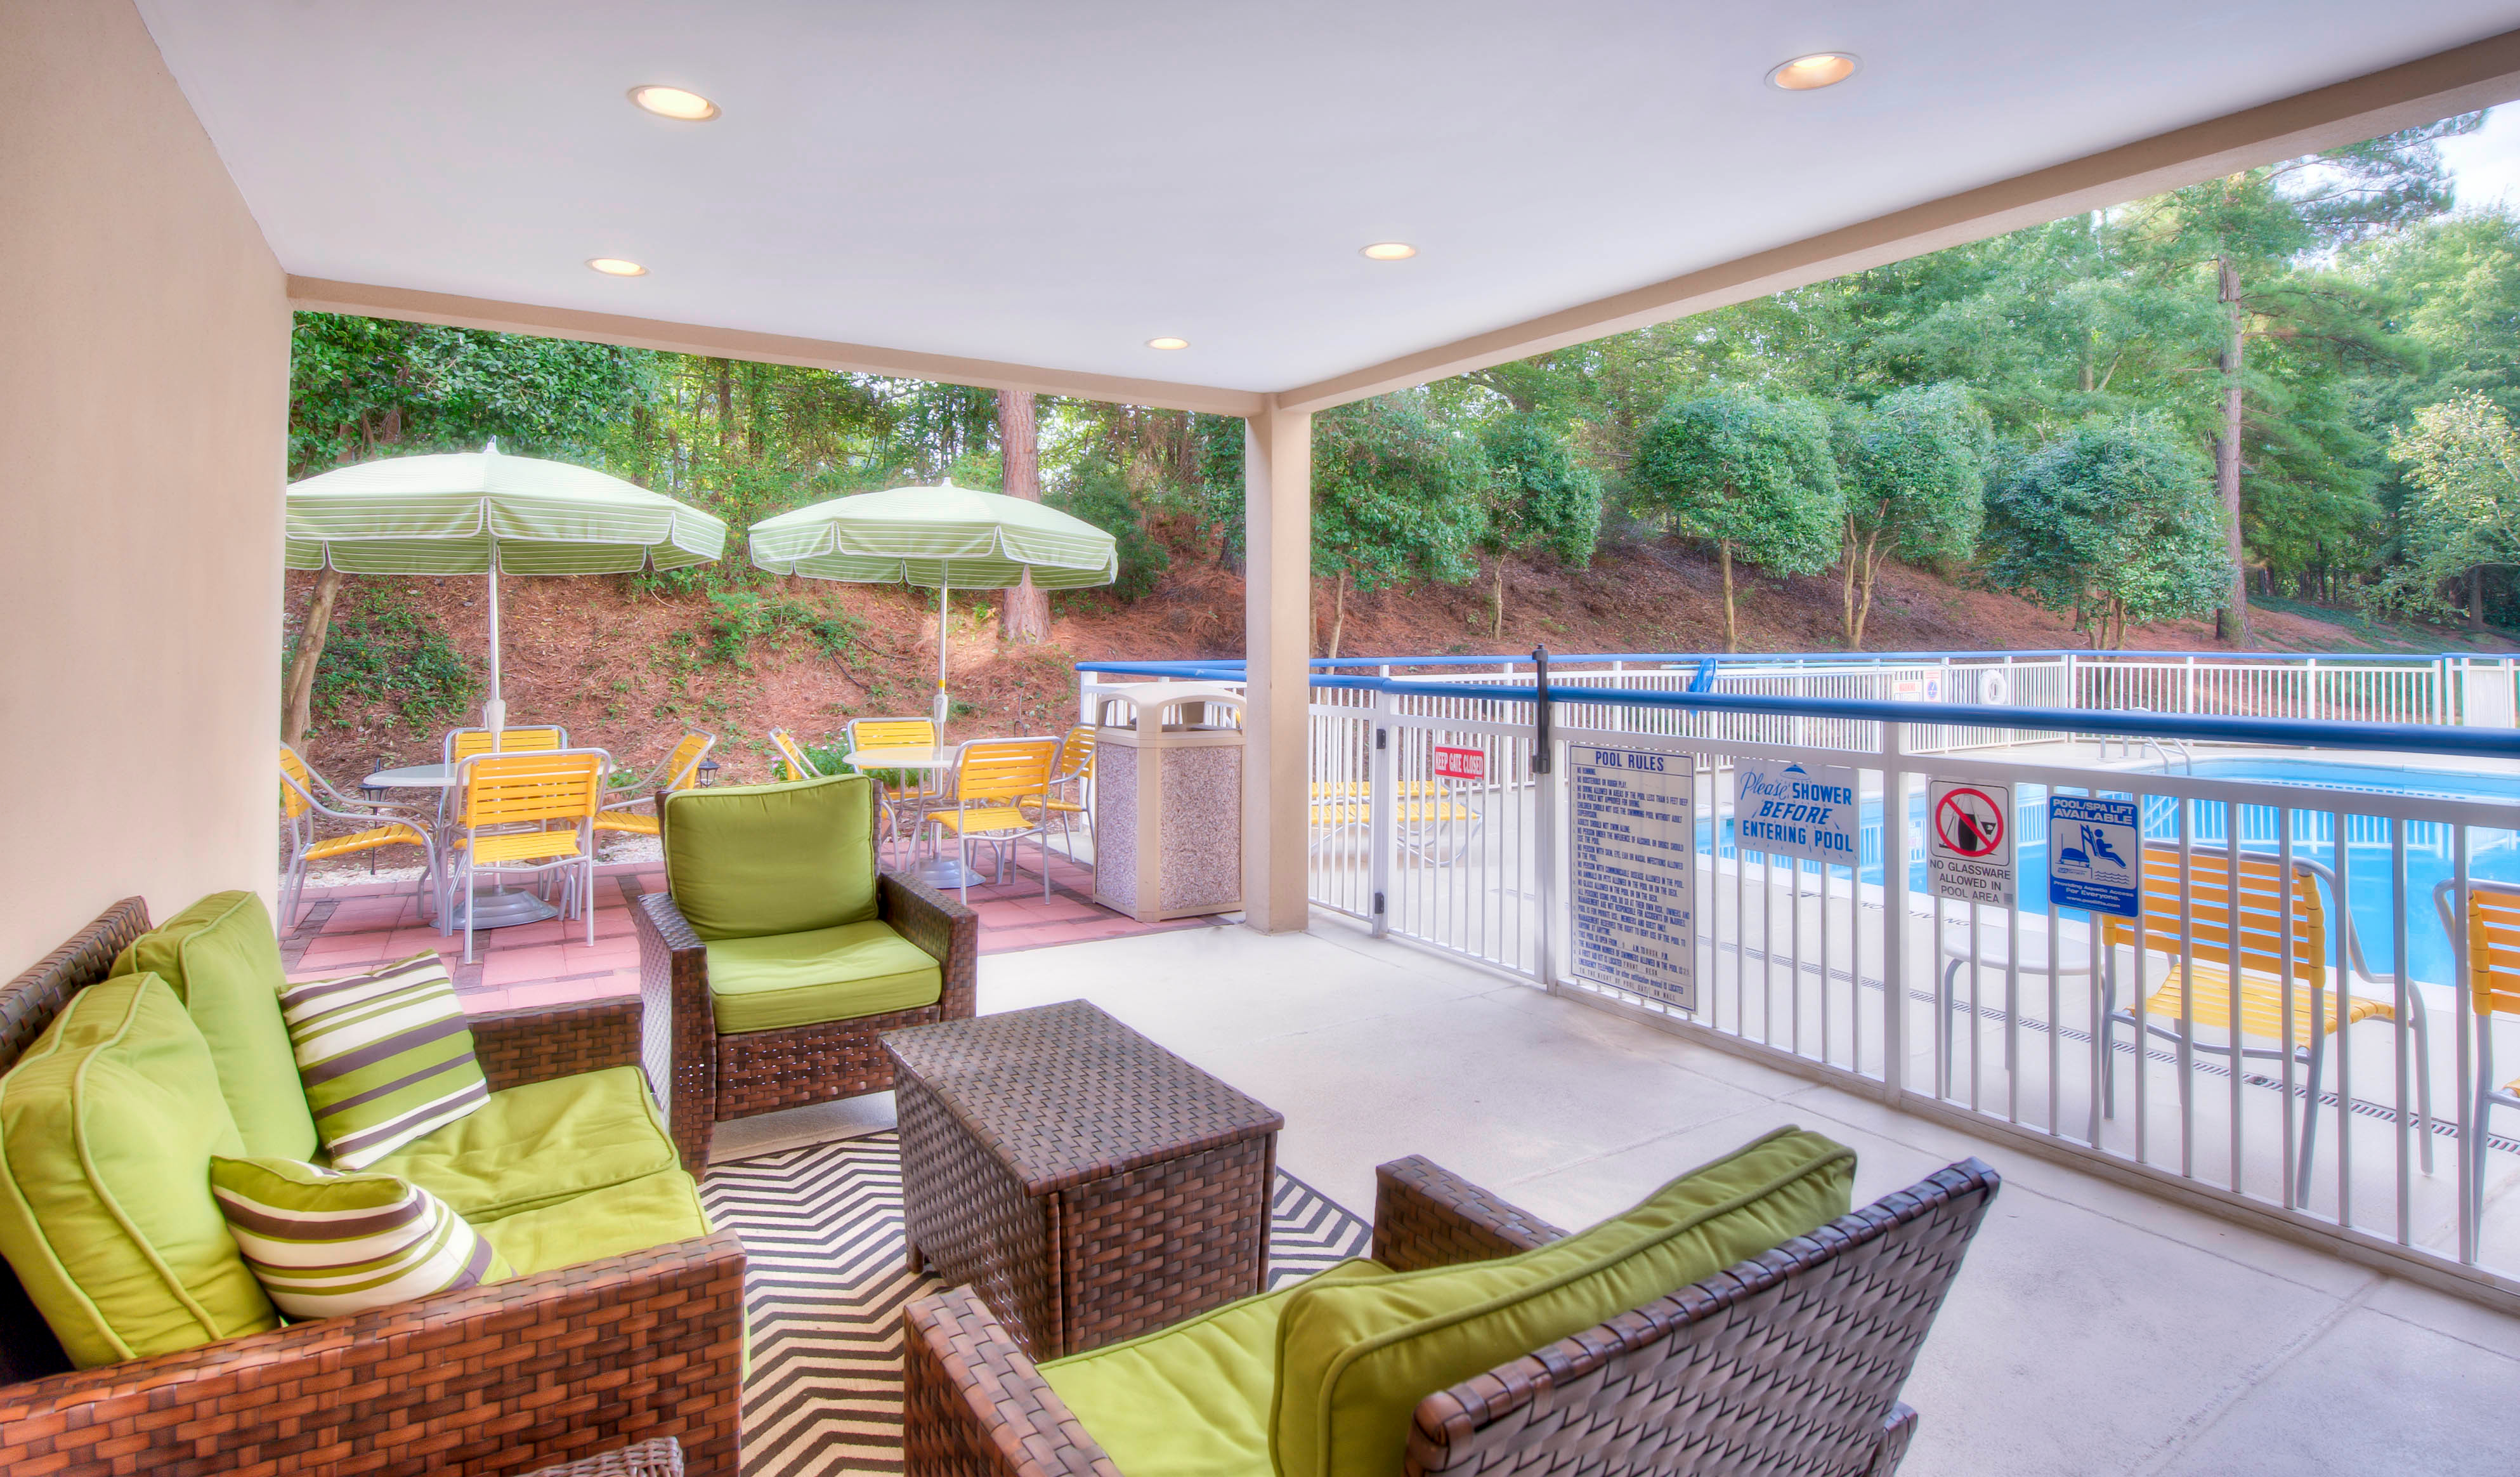 Fairfield Inn & Suites by Marriott Raleigh Crabtree Valley image 3